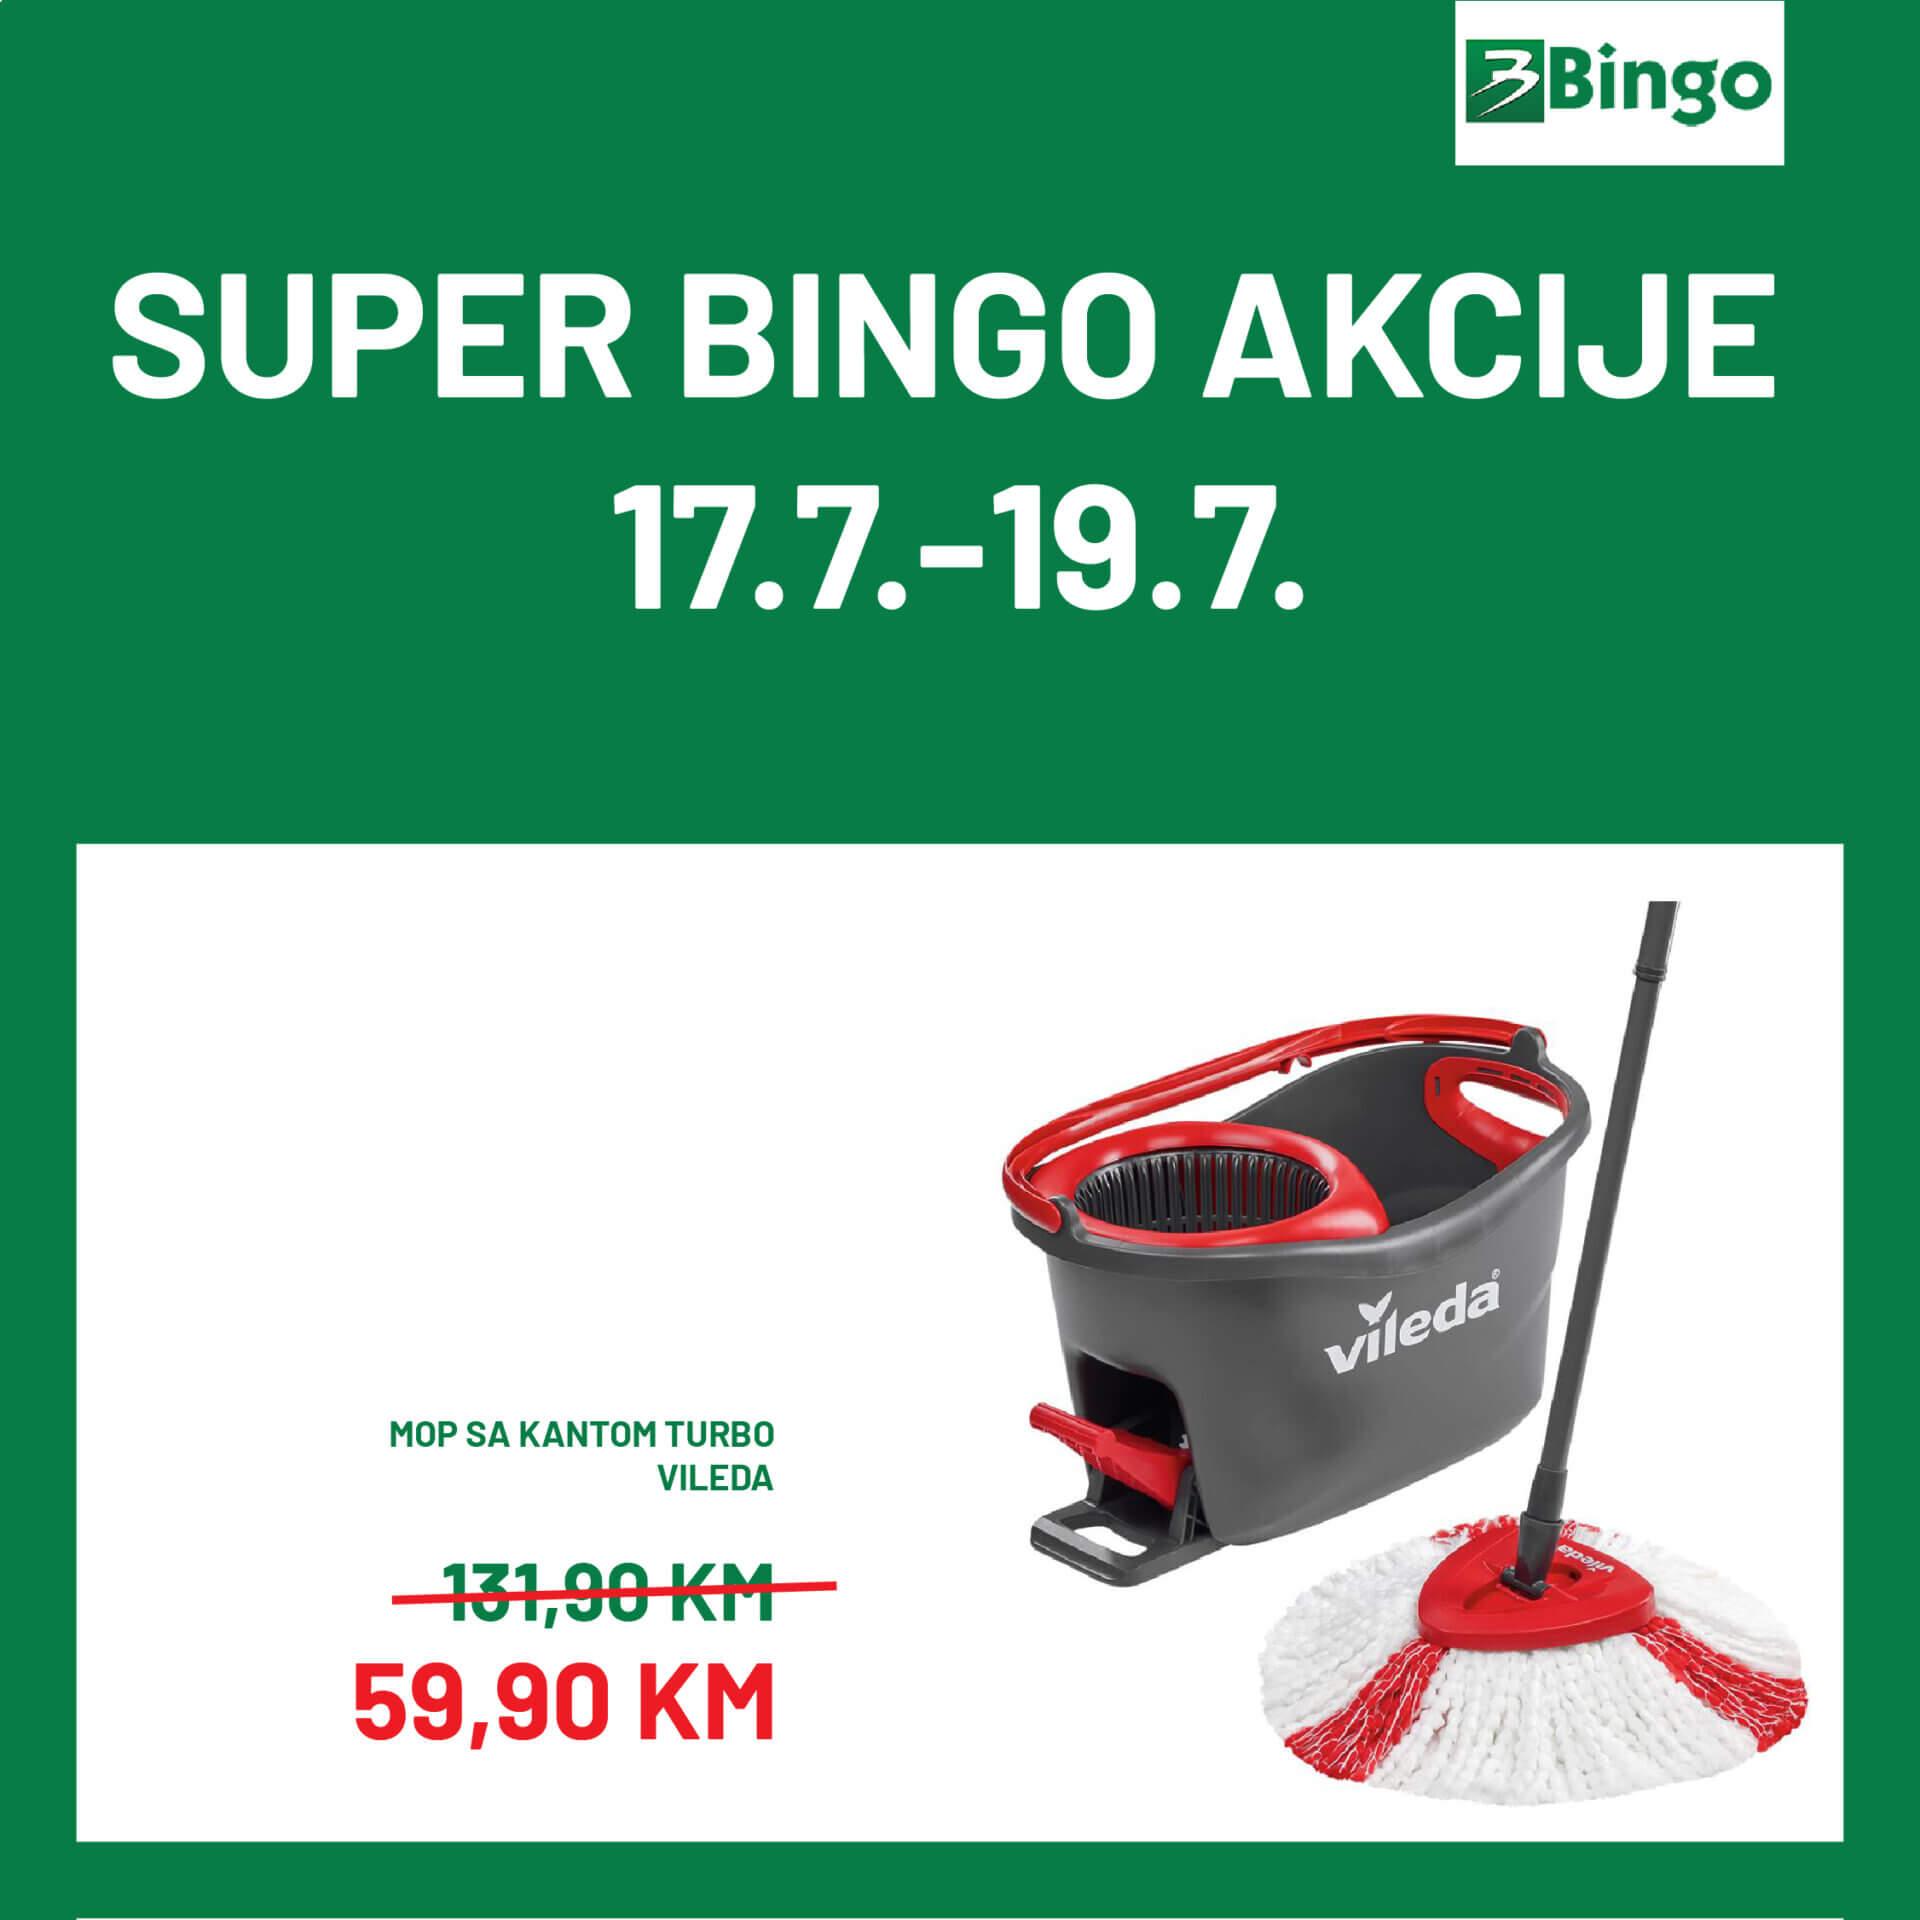 BINGO katalog Page 1 1